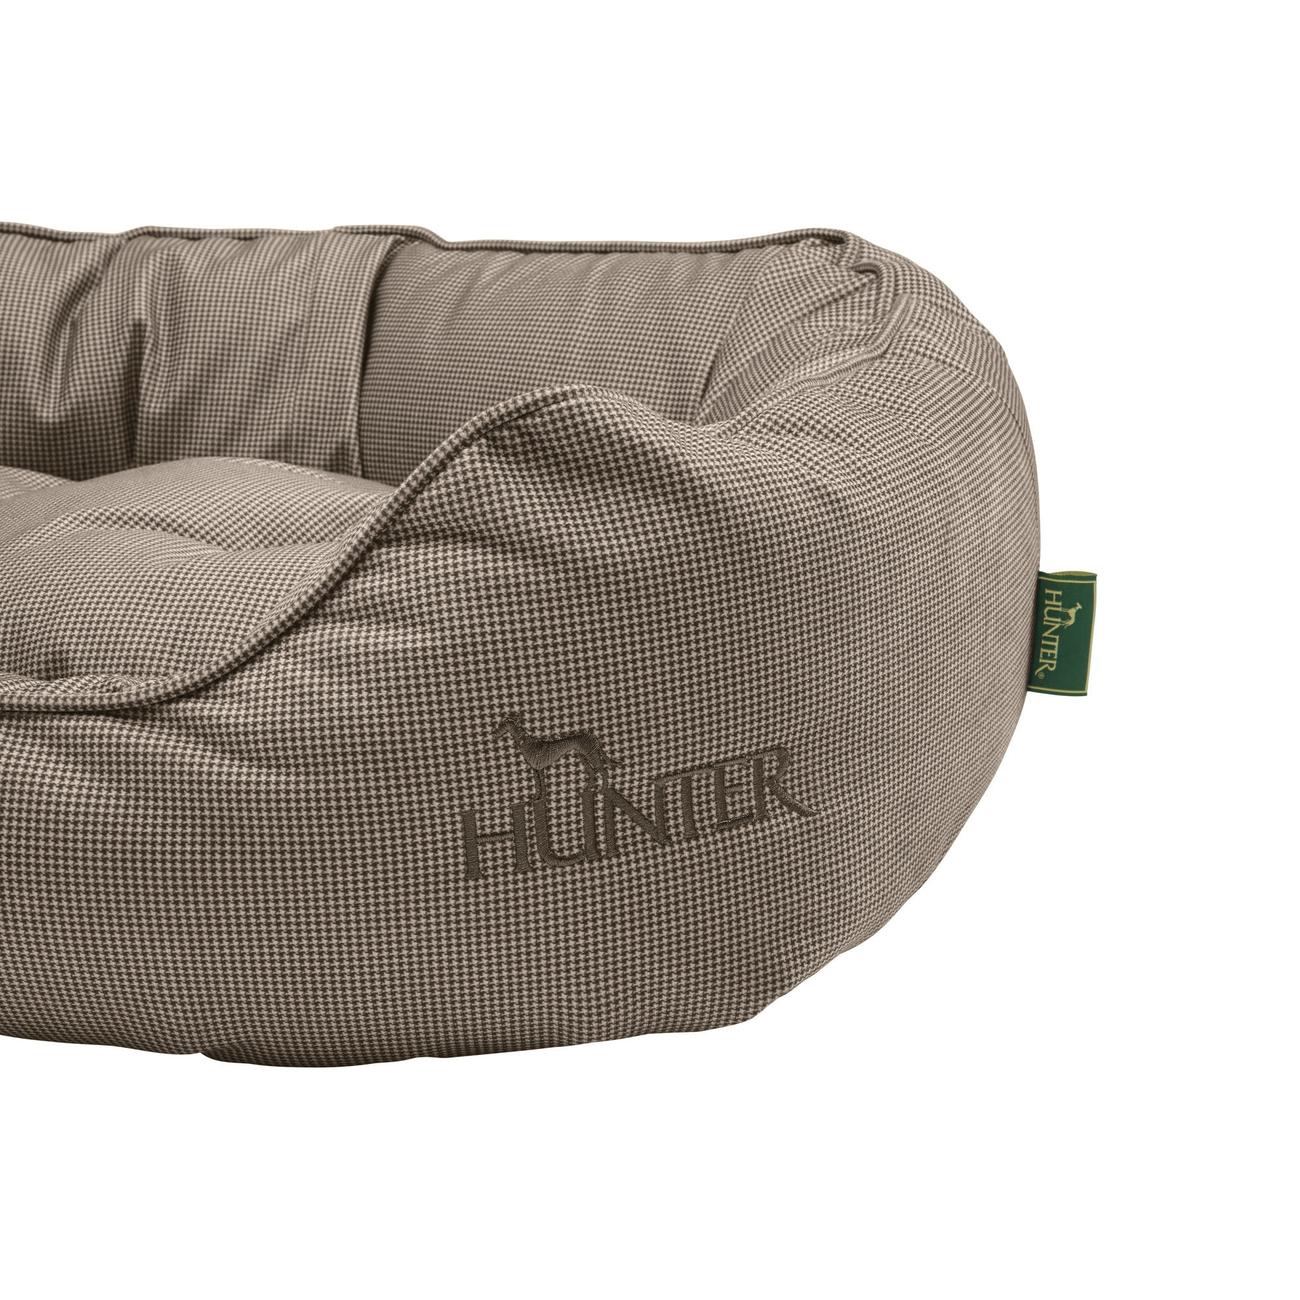 Hunter Hundesofa Lancaster 65697, Bild 3